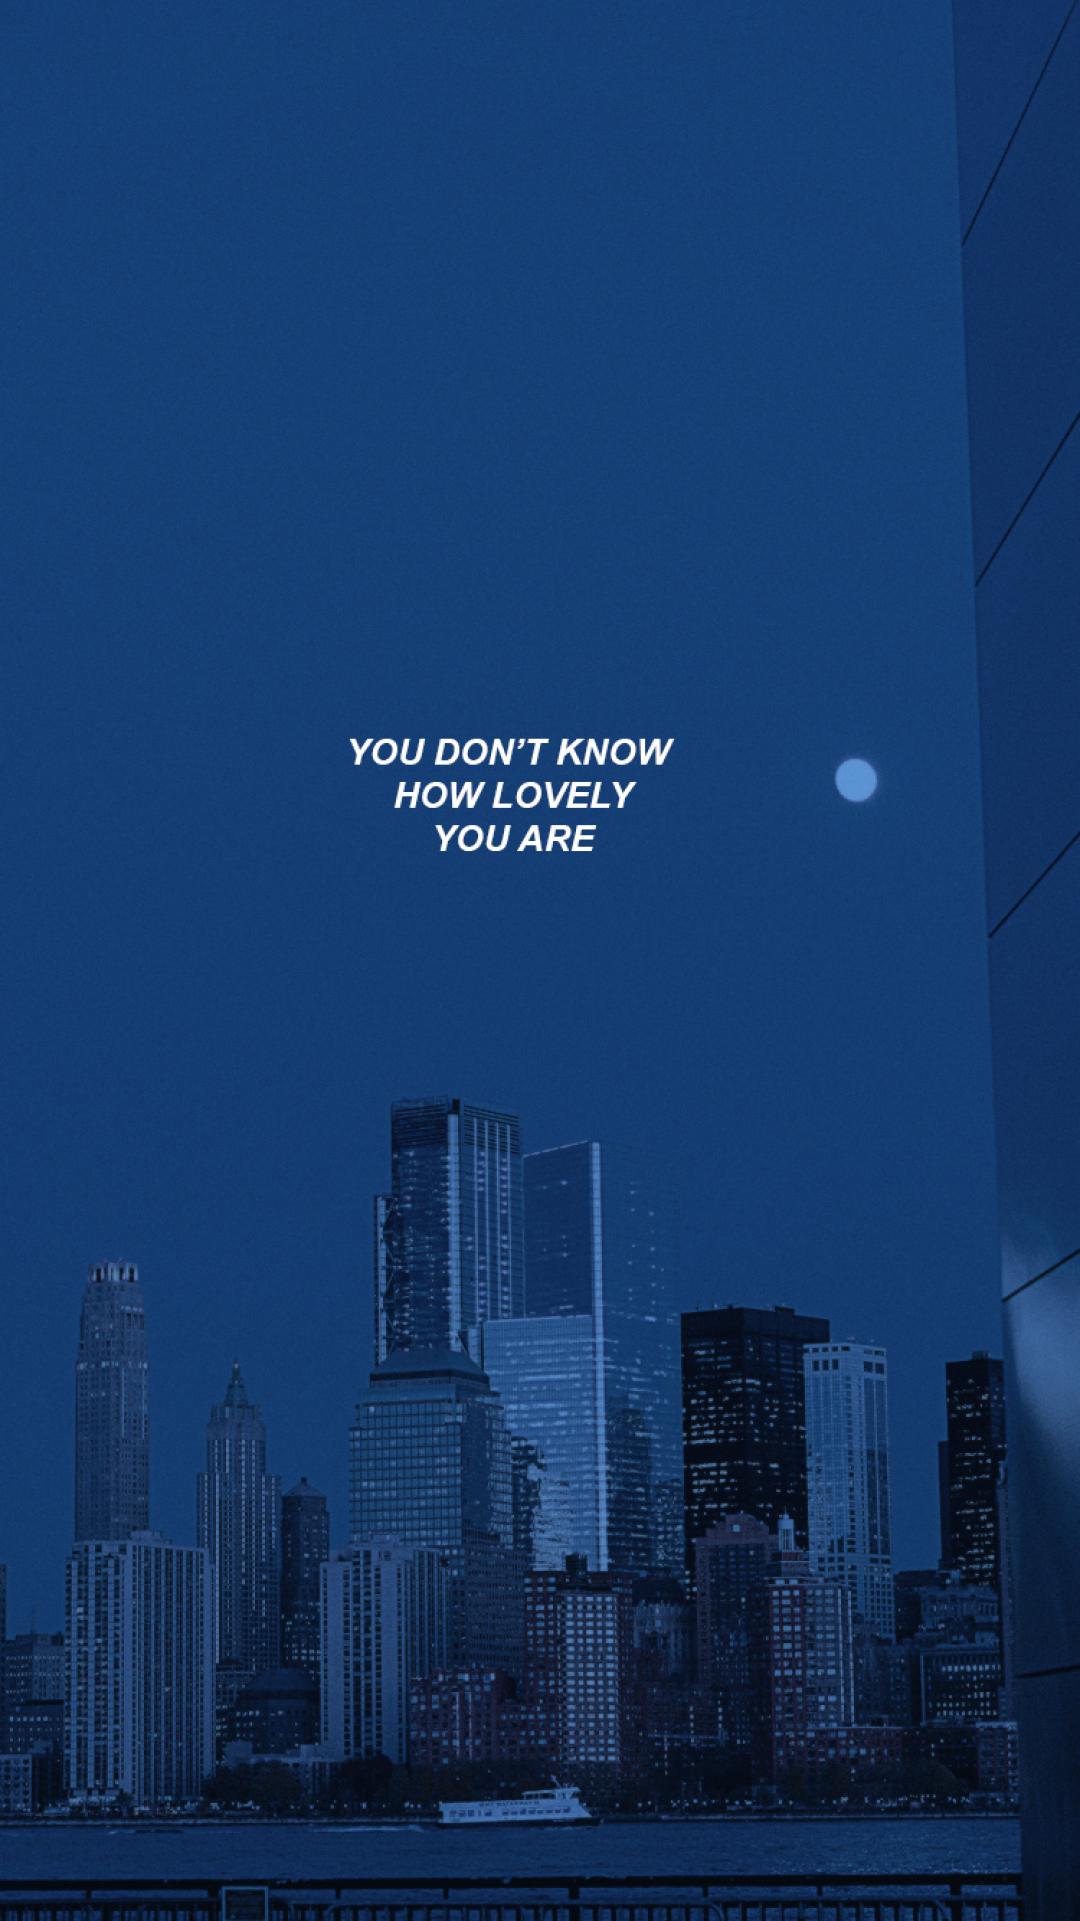 Blue Aesthetic Tumblr - Blue Aesthetic Wallpaper Sad - HD Wallpaper